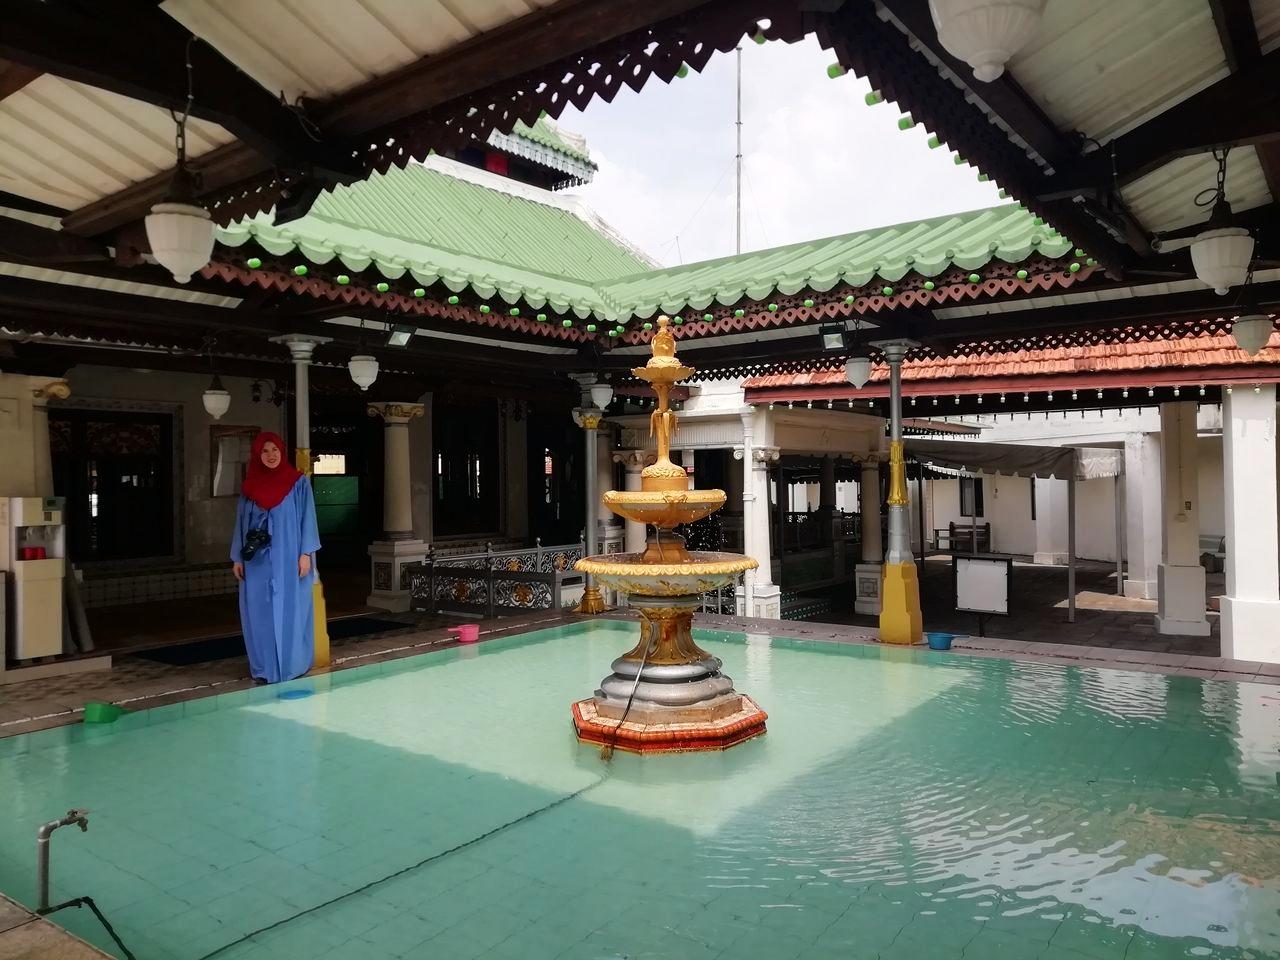 Patio de la mezquita Masjid Kampung Kling.